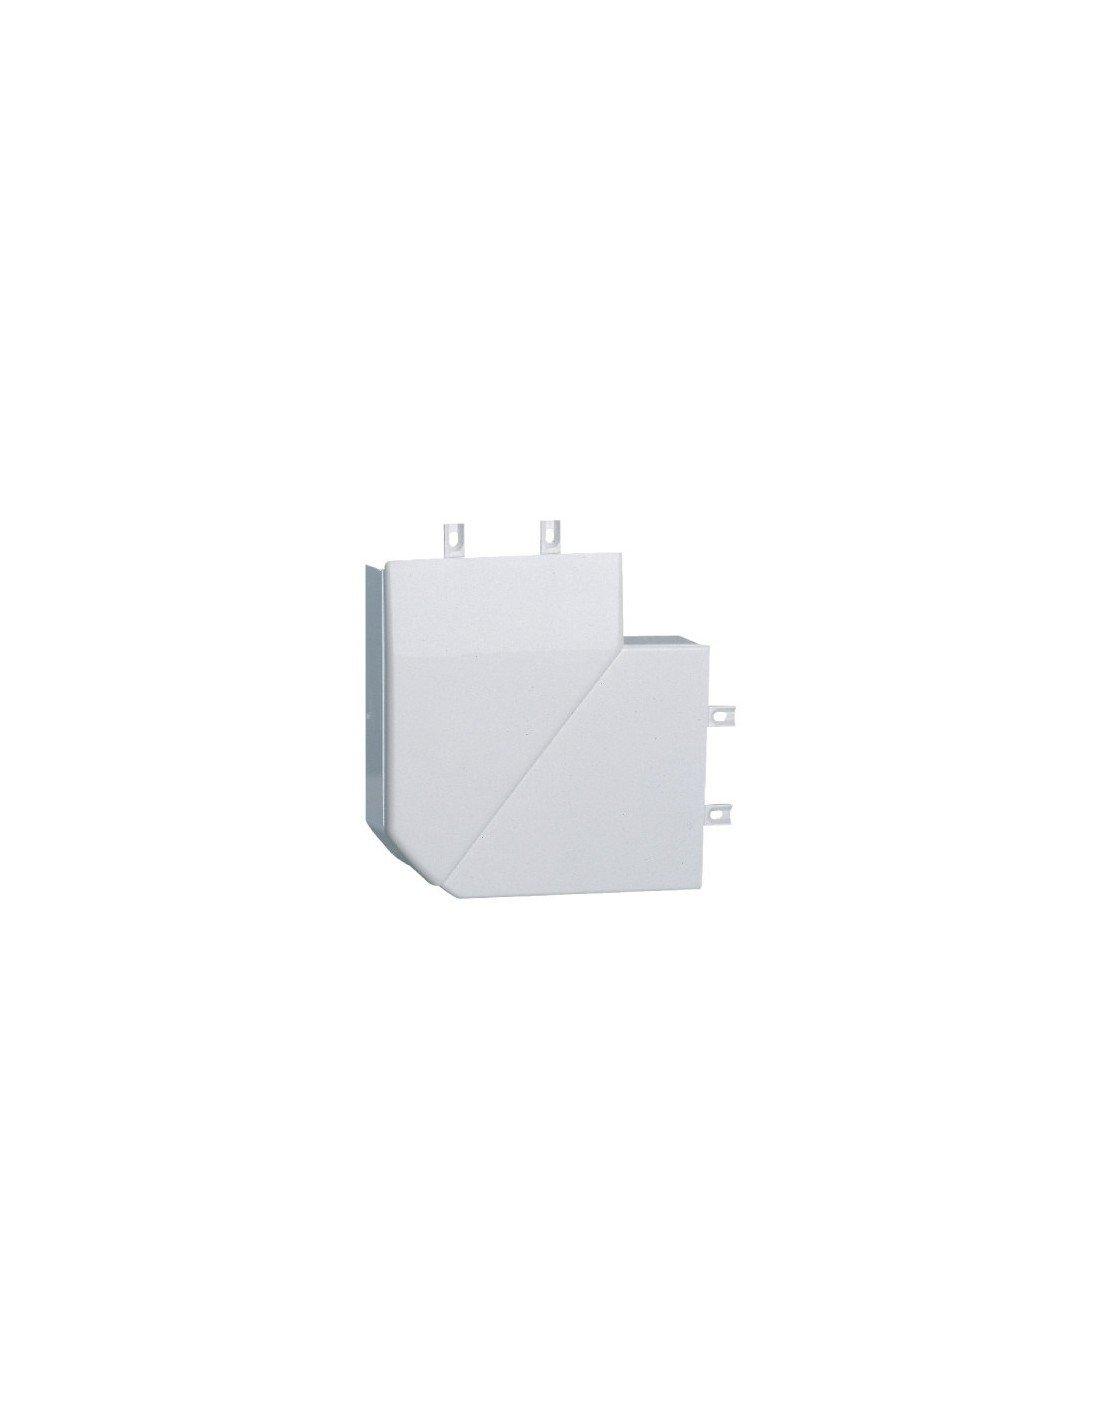 Legrand Minicanal Dlpus 030223 - Dlp Angulo Plano Variable